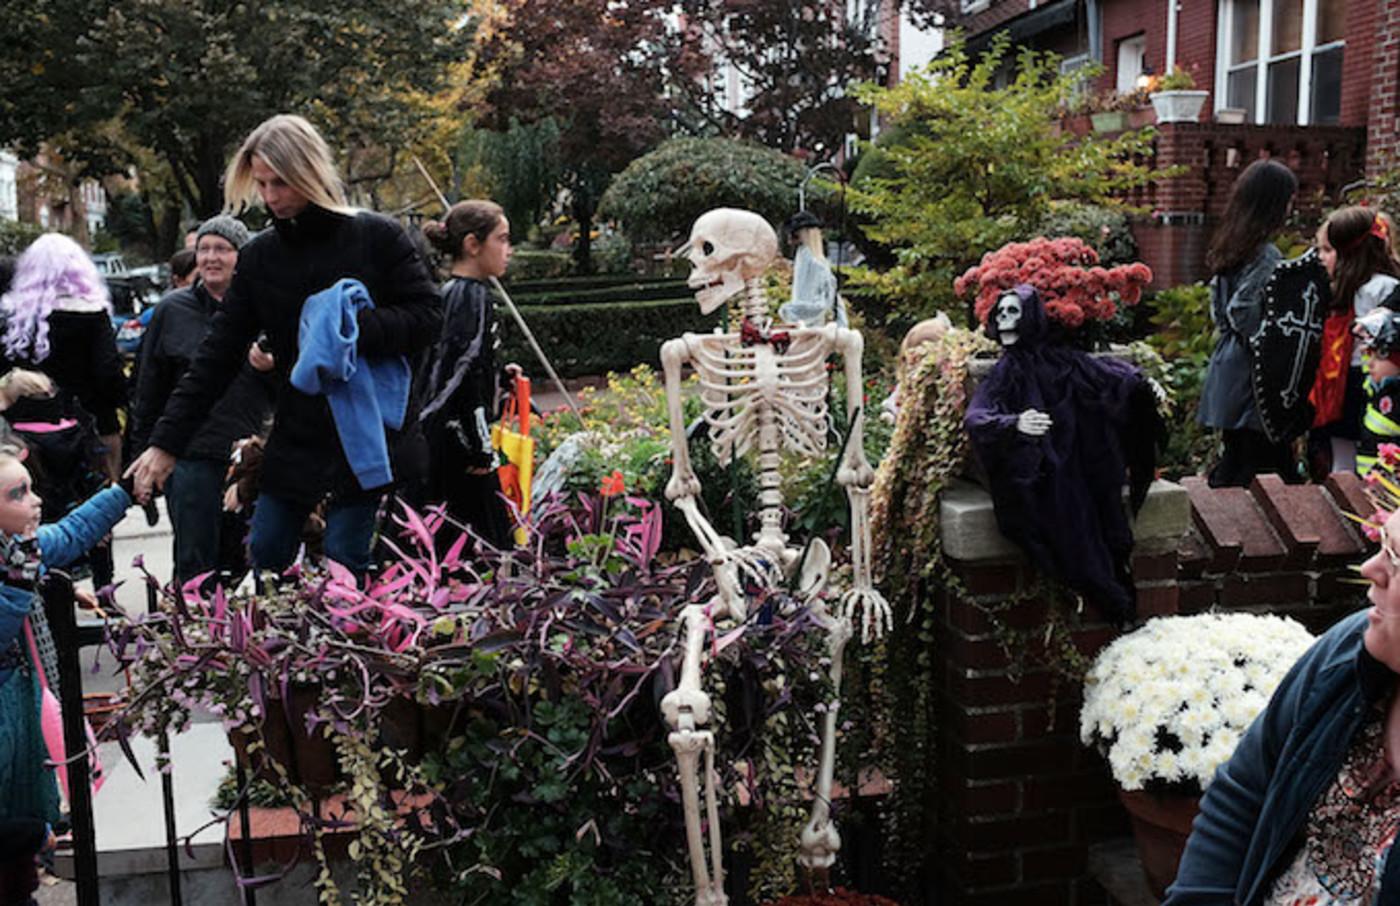 People trick-or-treat in a Brooklyn neighborhood on Halloween night.